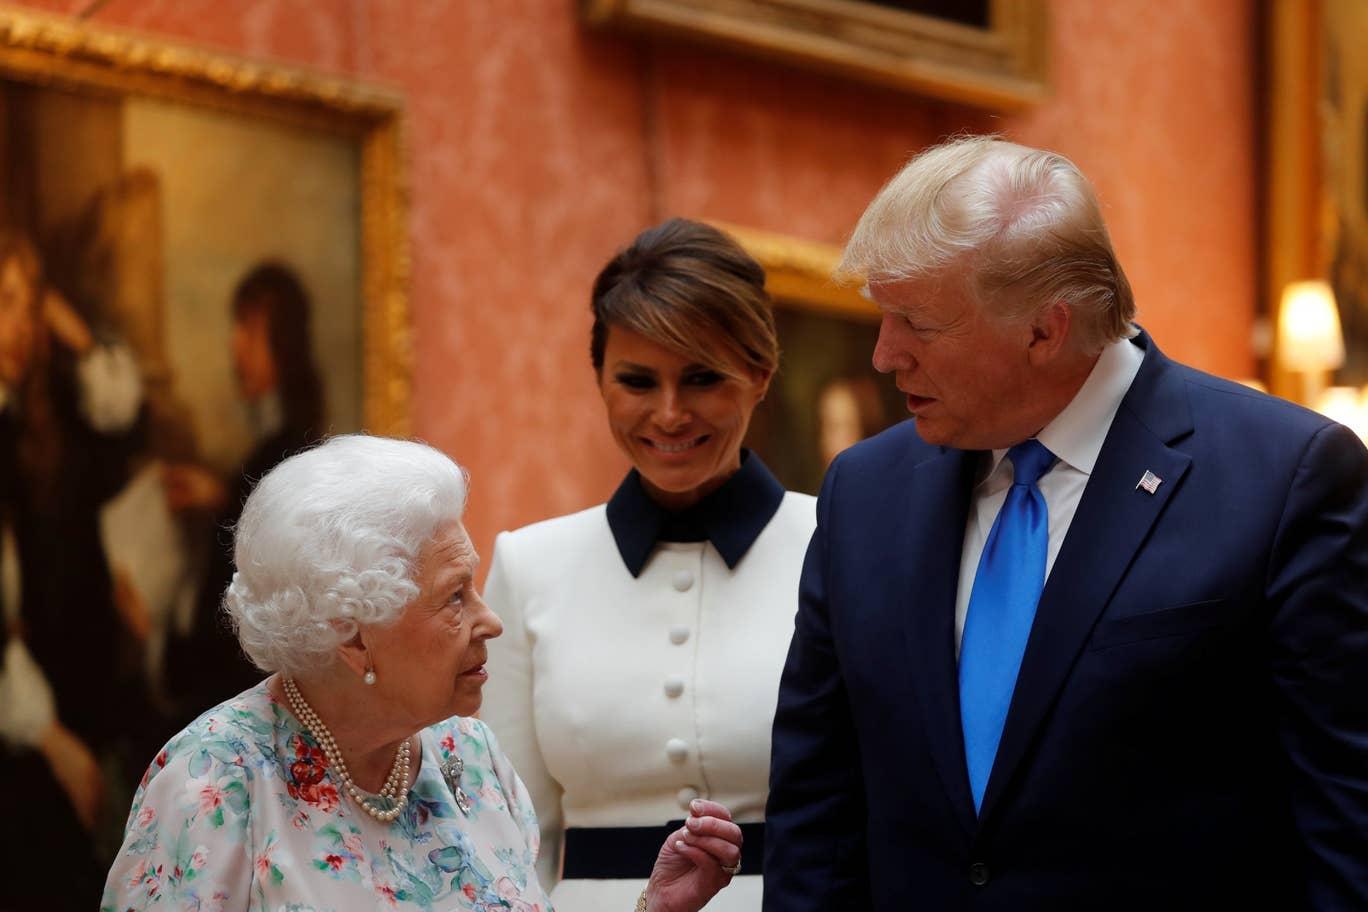 trump-queen-melania.jpg